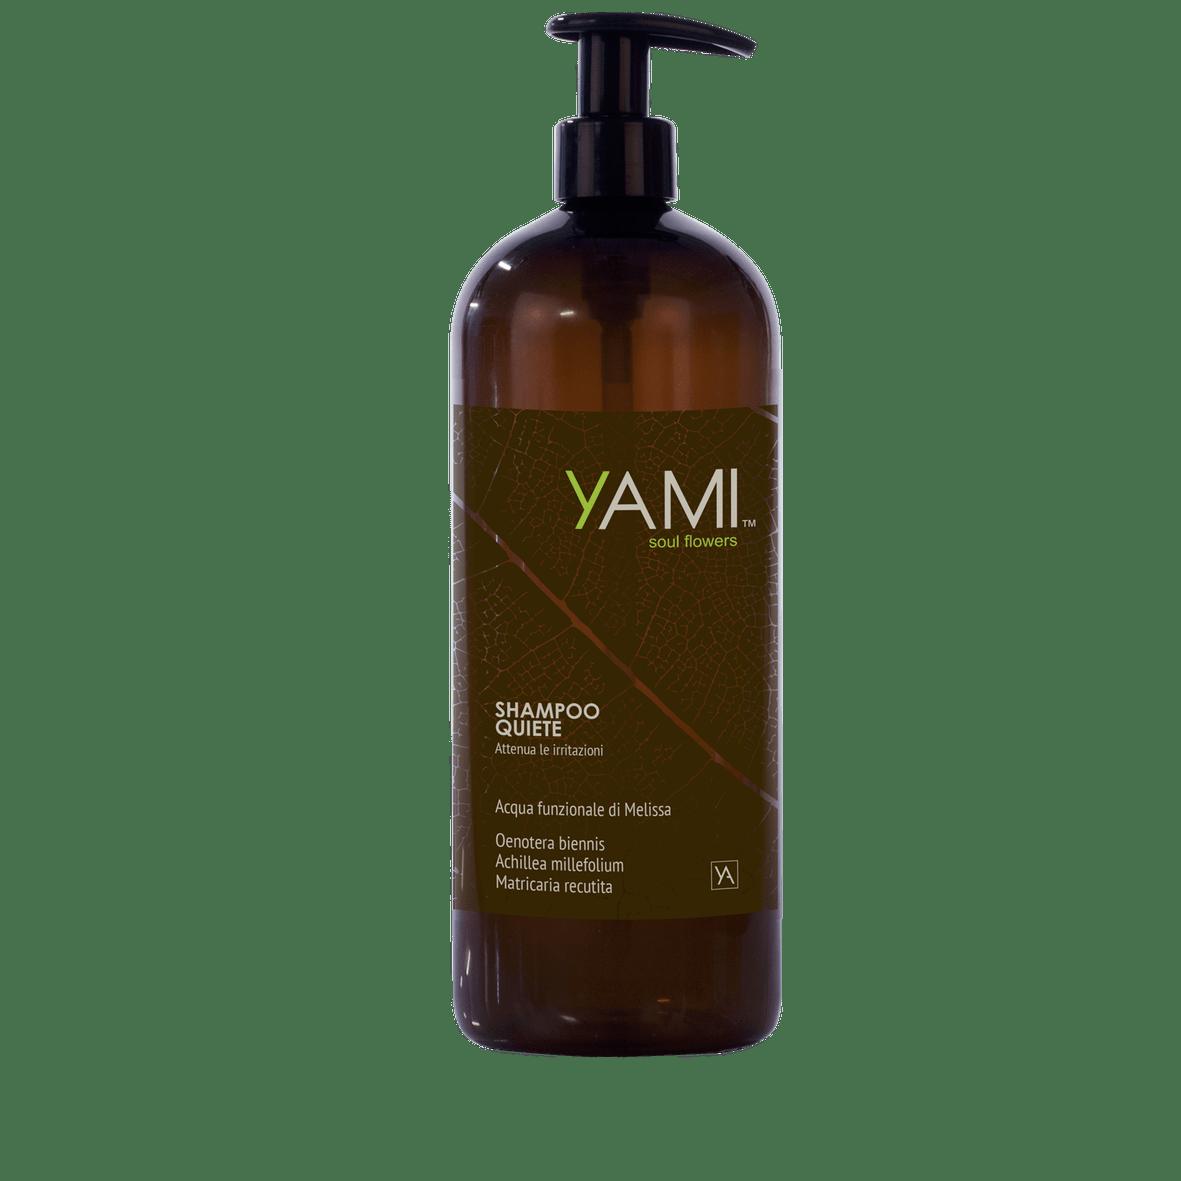 shampoo Quiete 1000ml